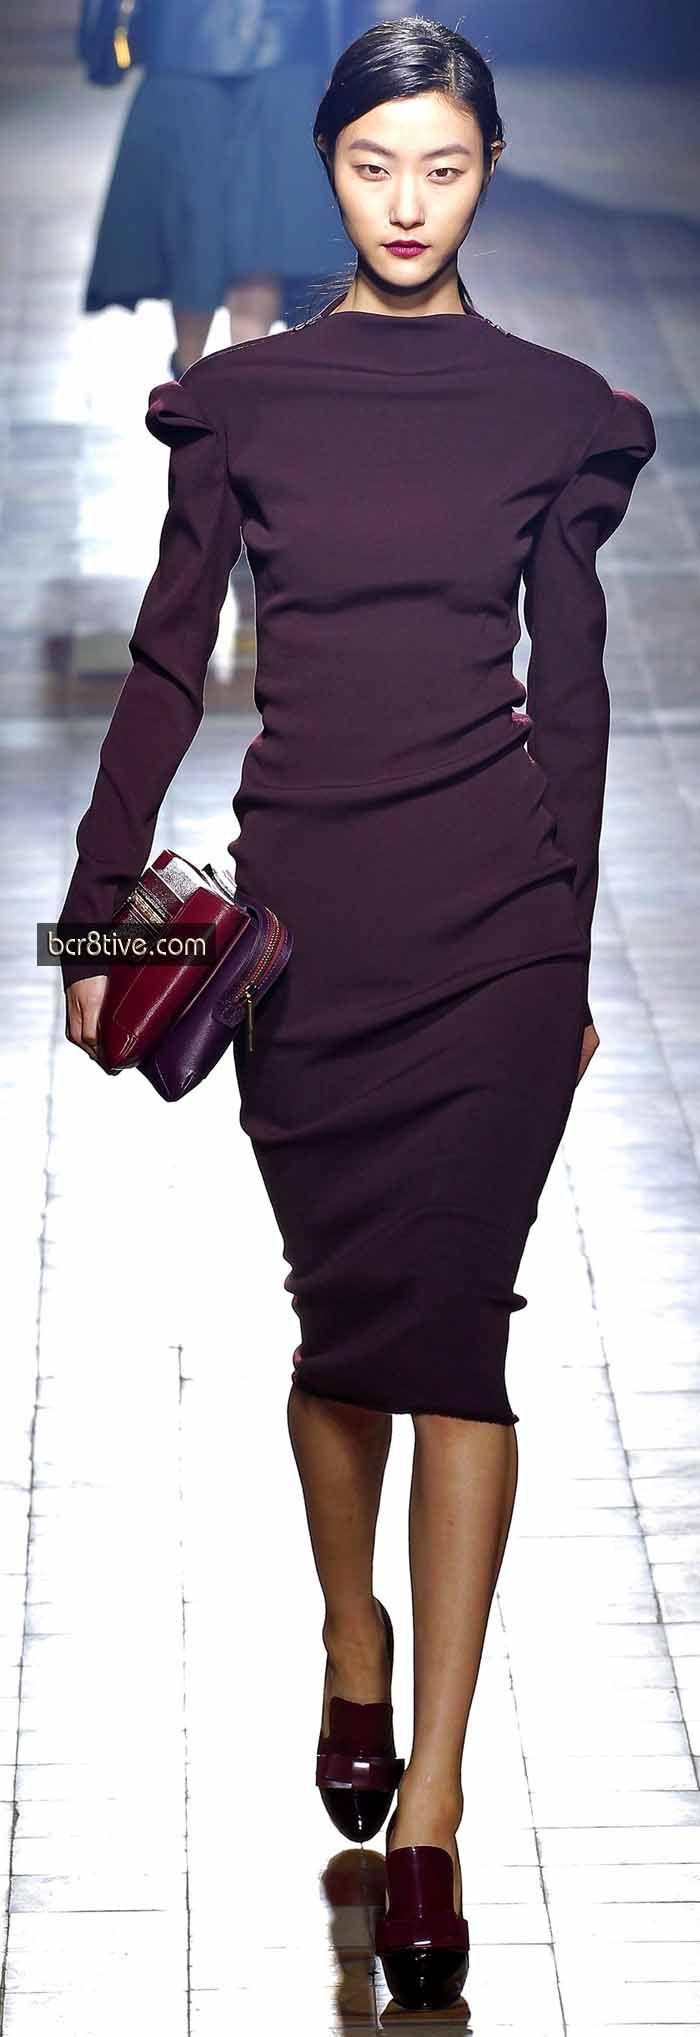 143 Best style images   Style, Fashion, Style inspiration